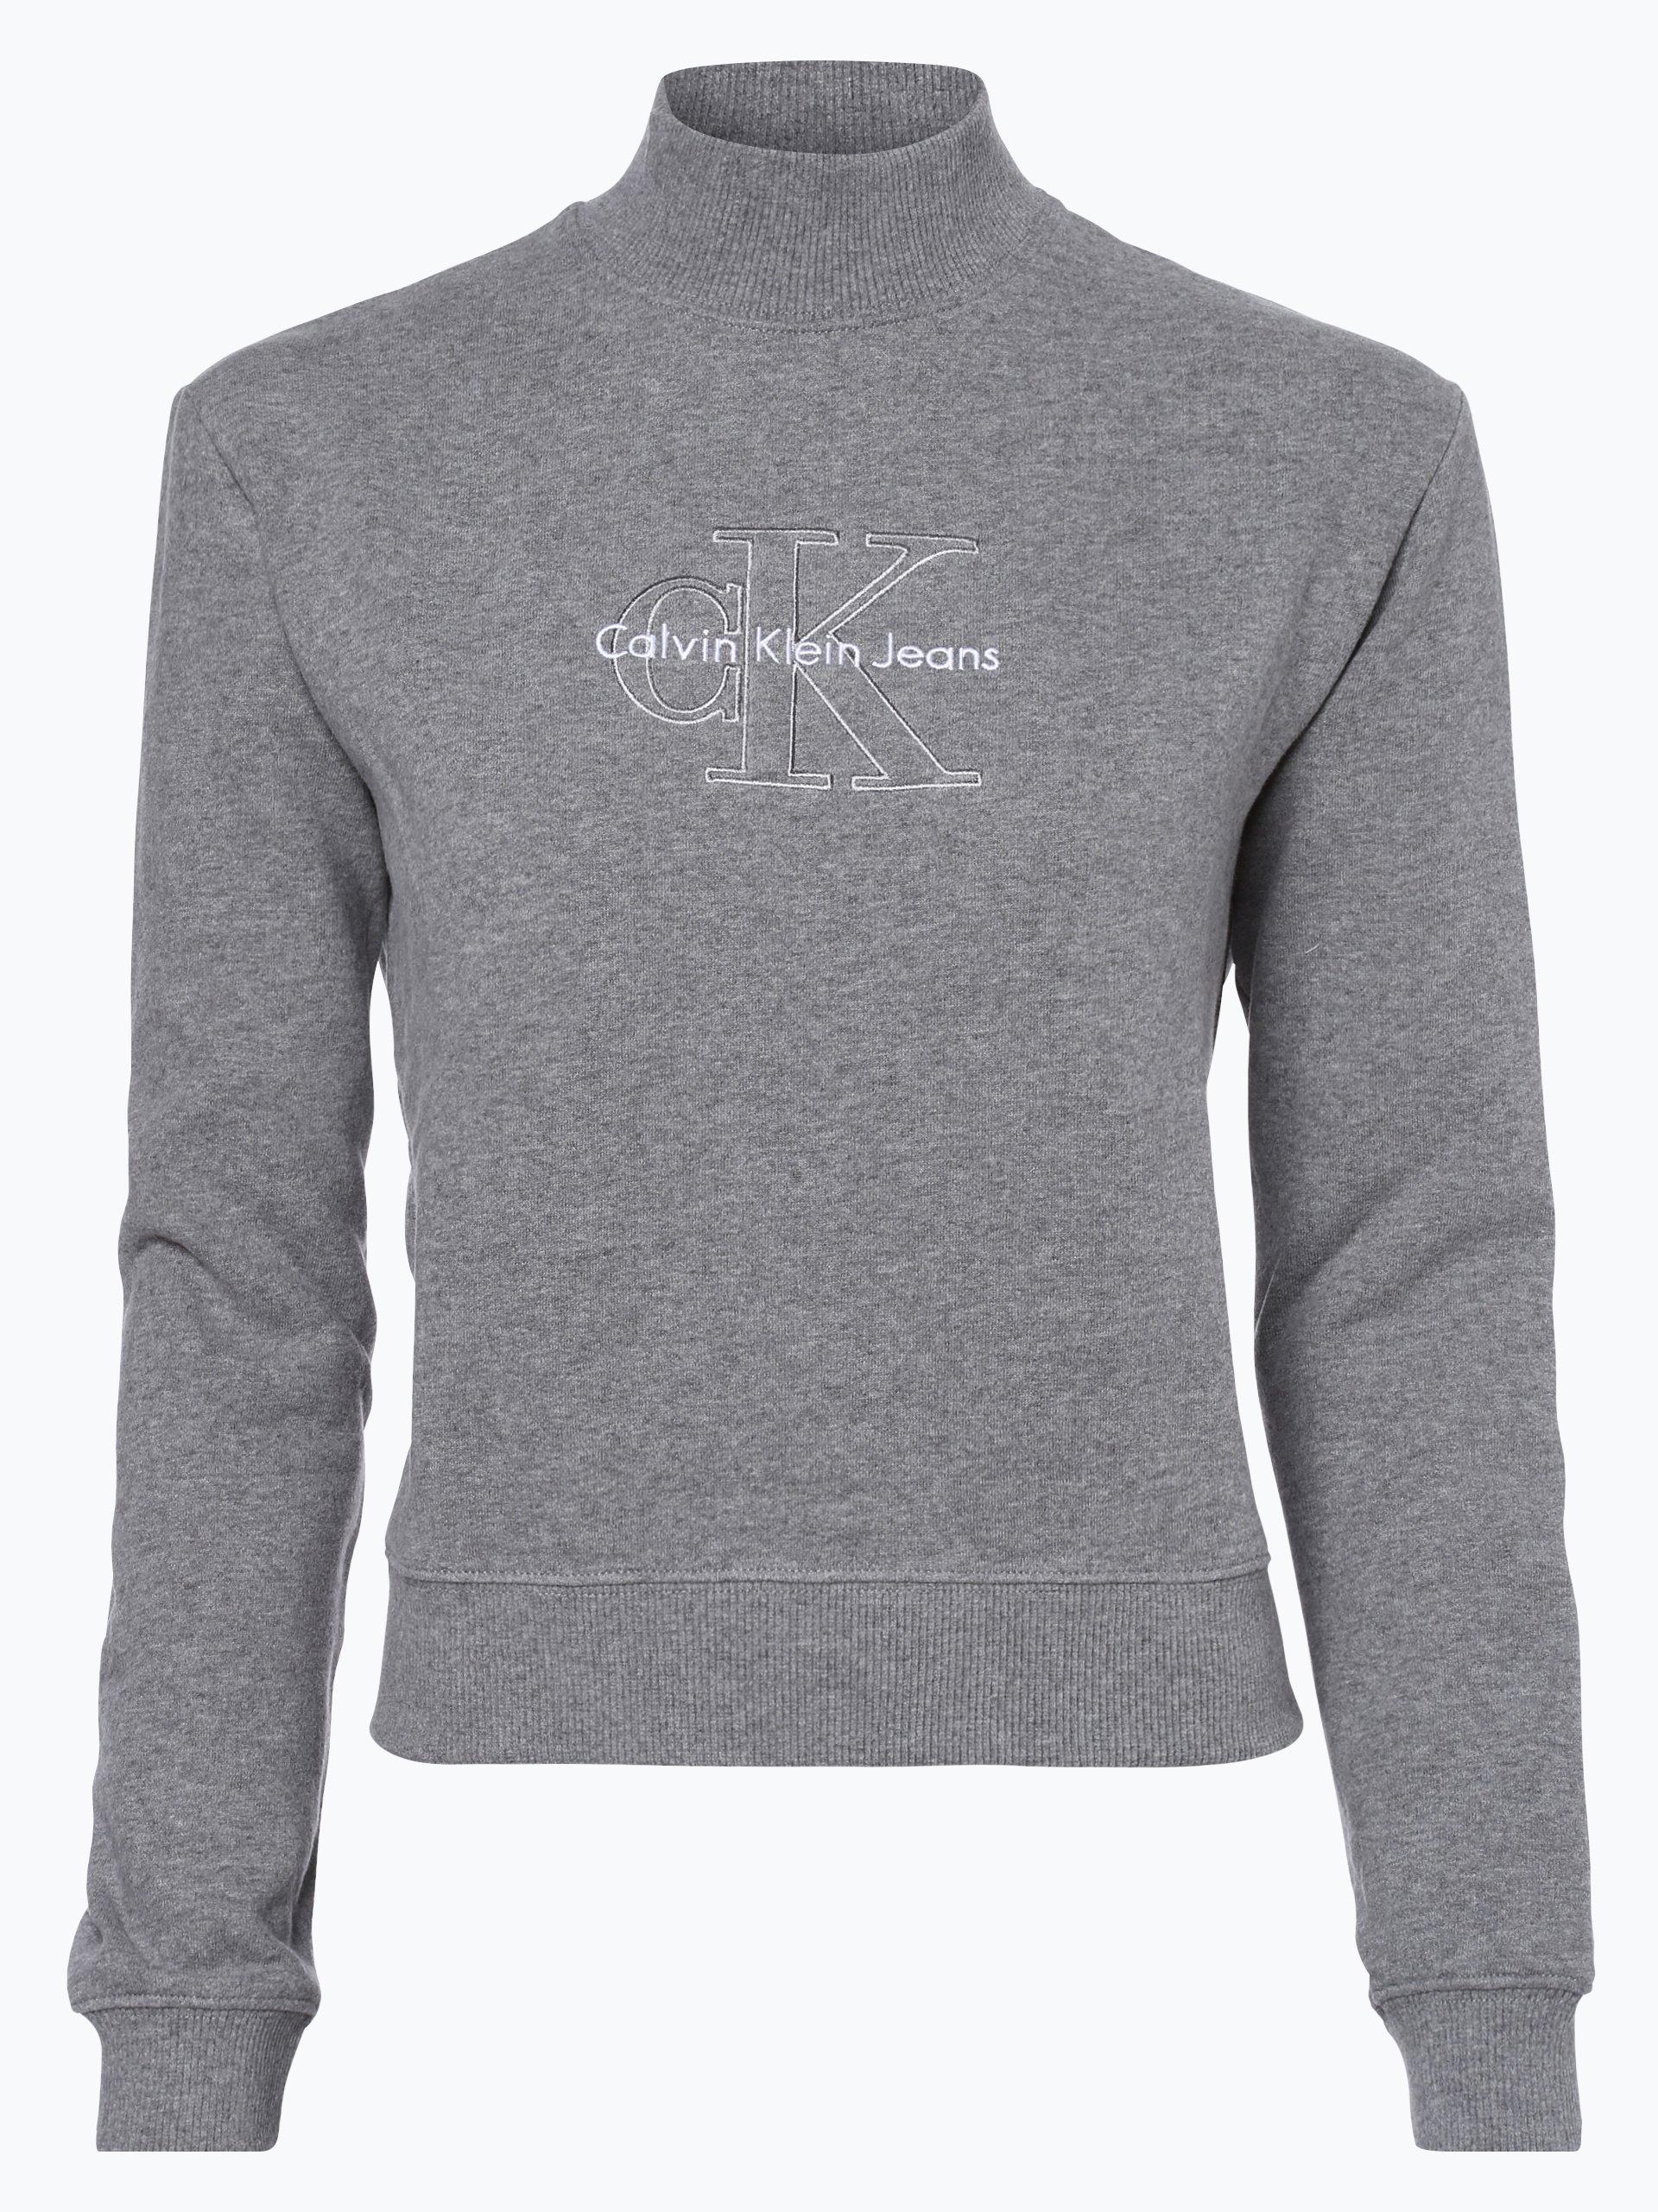 calvin klein jeans damen sweatshirt grau uni online kaufen vangraaf com. Black Bedroom Furniture Sets. Home Design Ideas